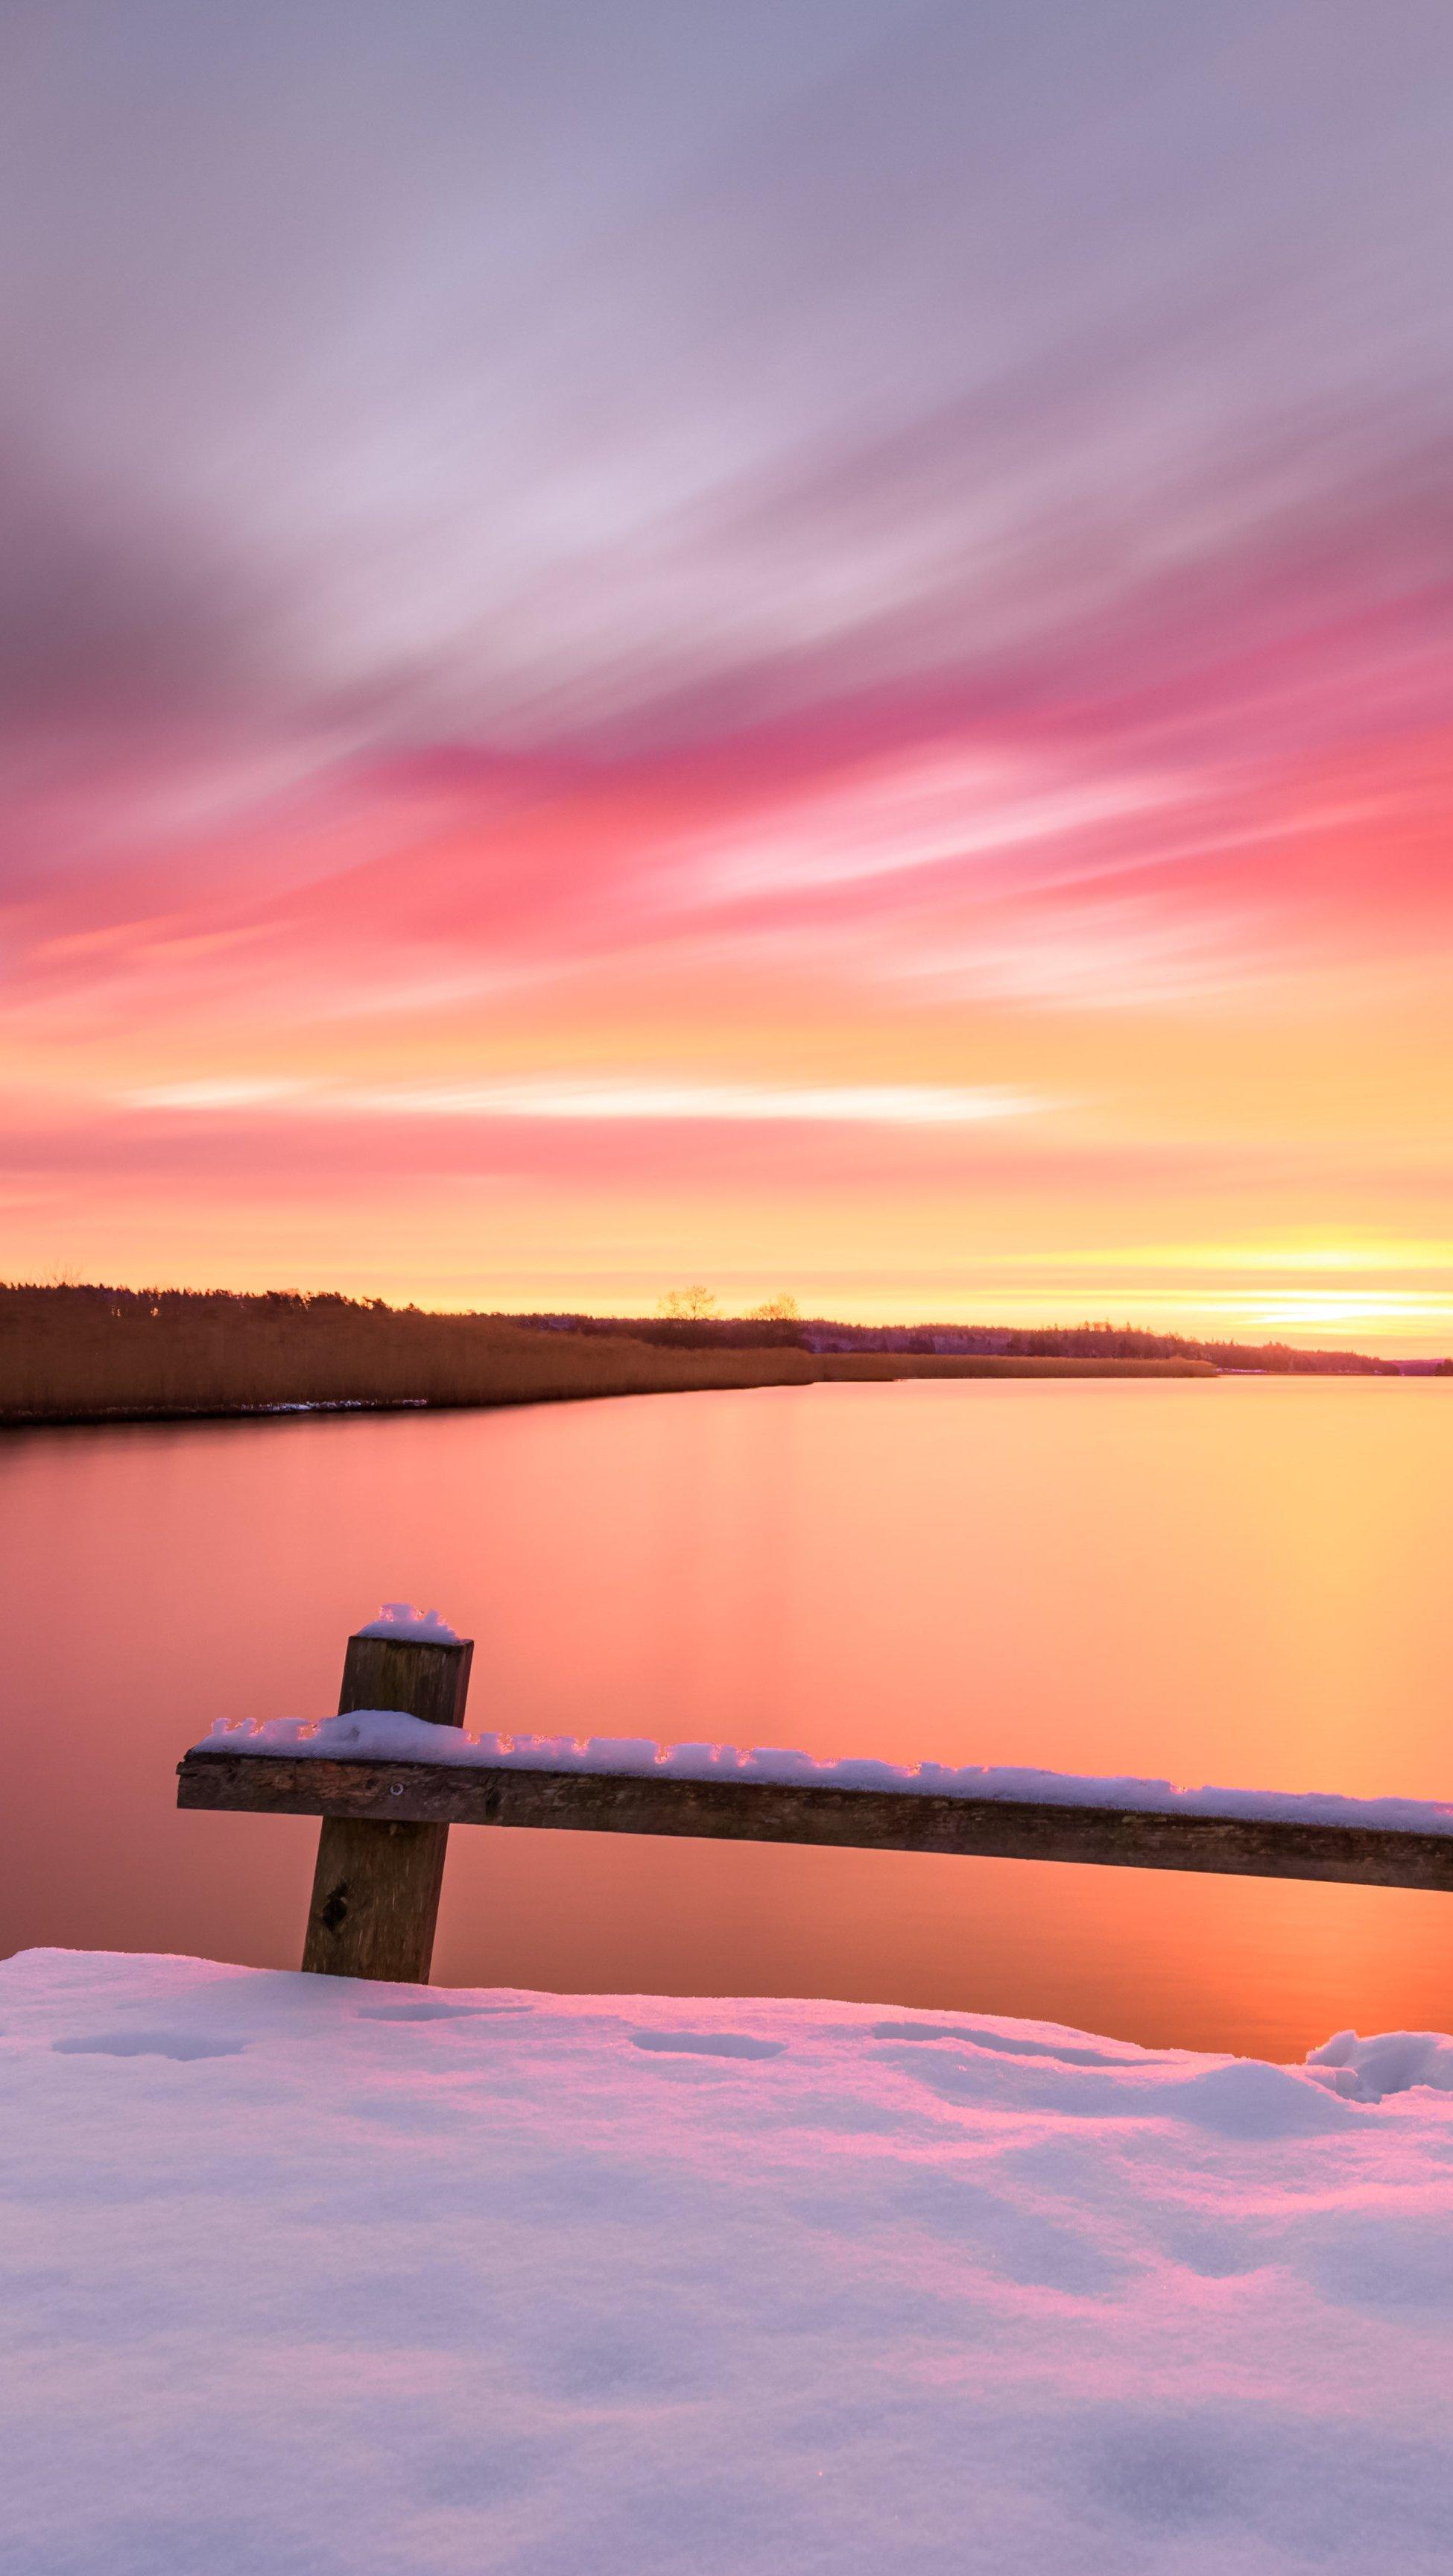 Fondos de pantalla Amanecer en lago con nieve Vertical